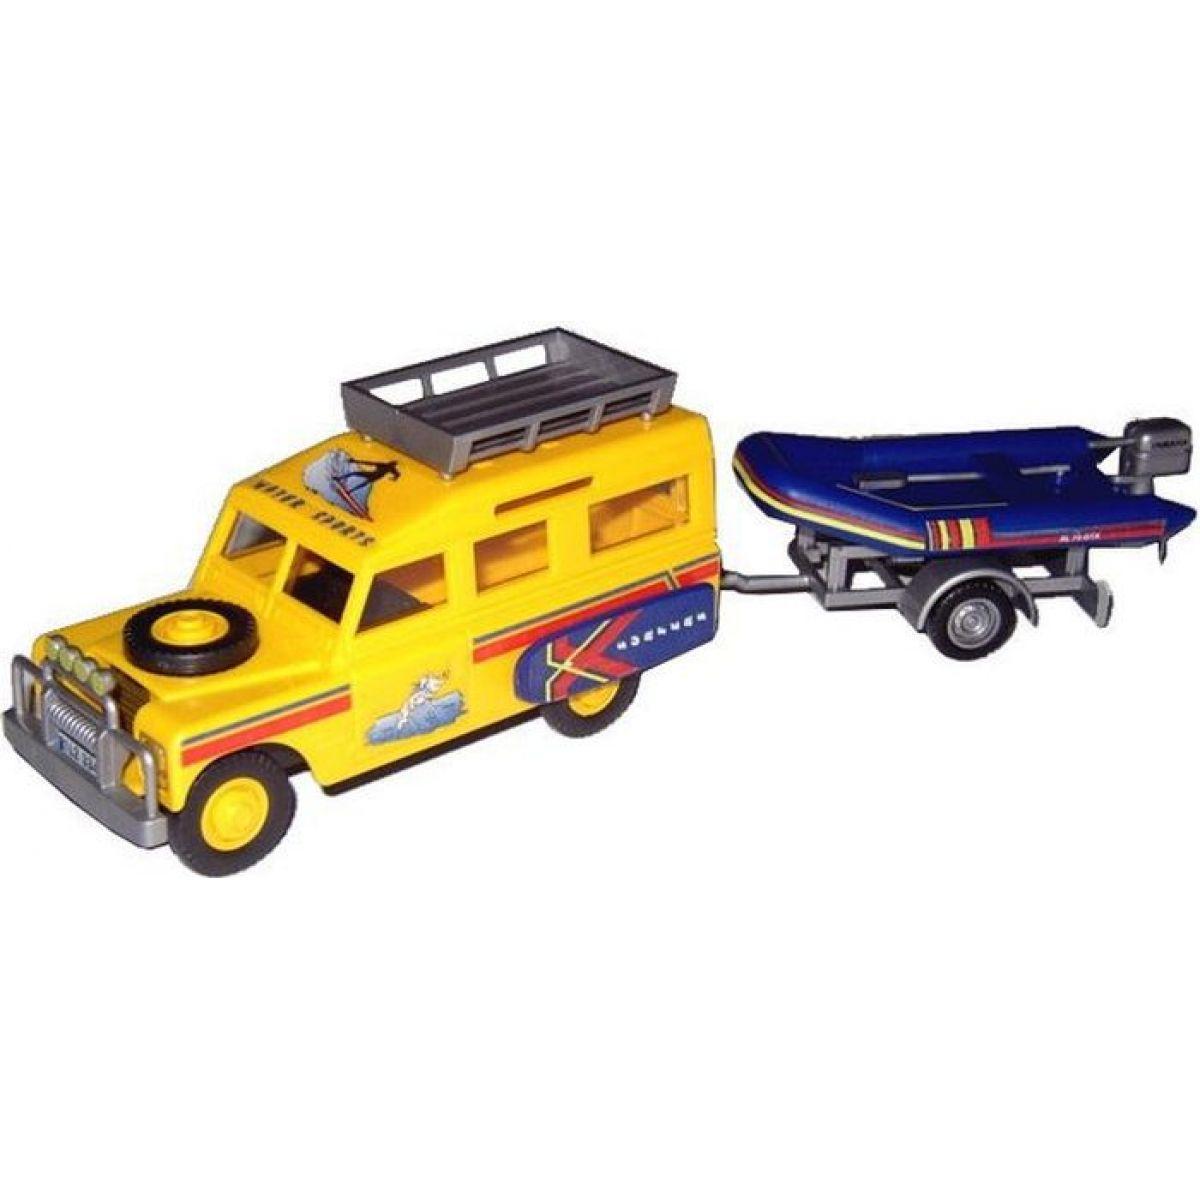 Monti 63 Land Rover vlek s loďkou člunem 1:35